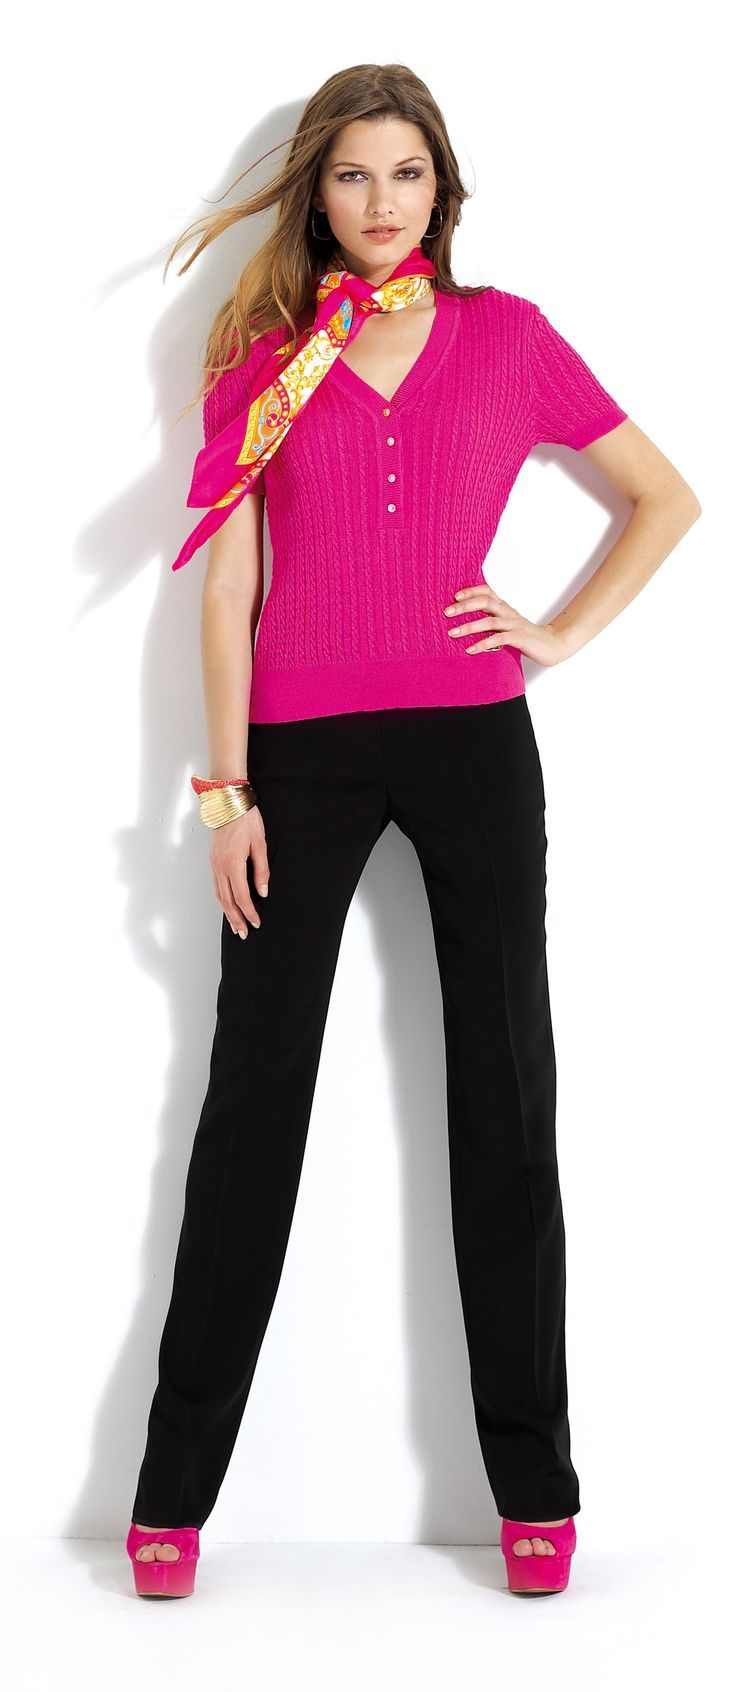 Pantalón negro con jersey de color #rosa #trousers #pink #tshirt